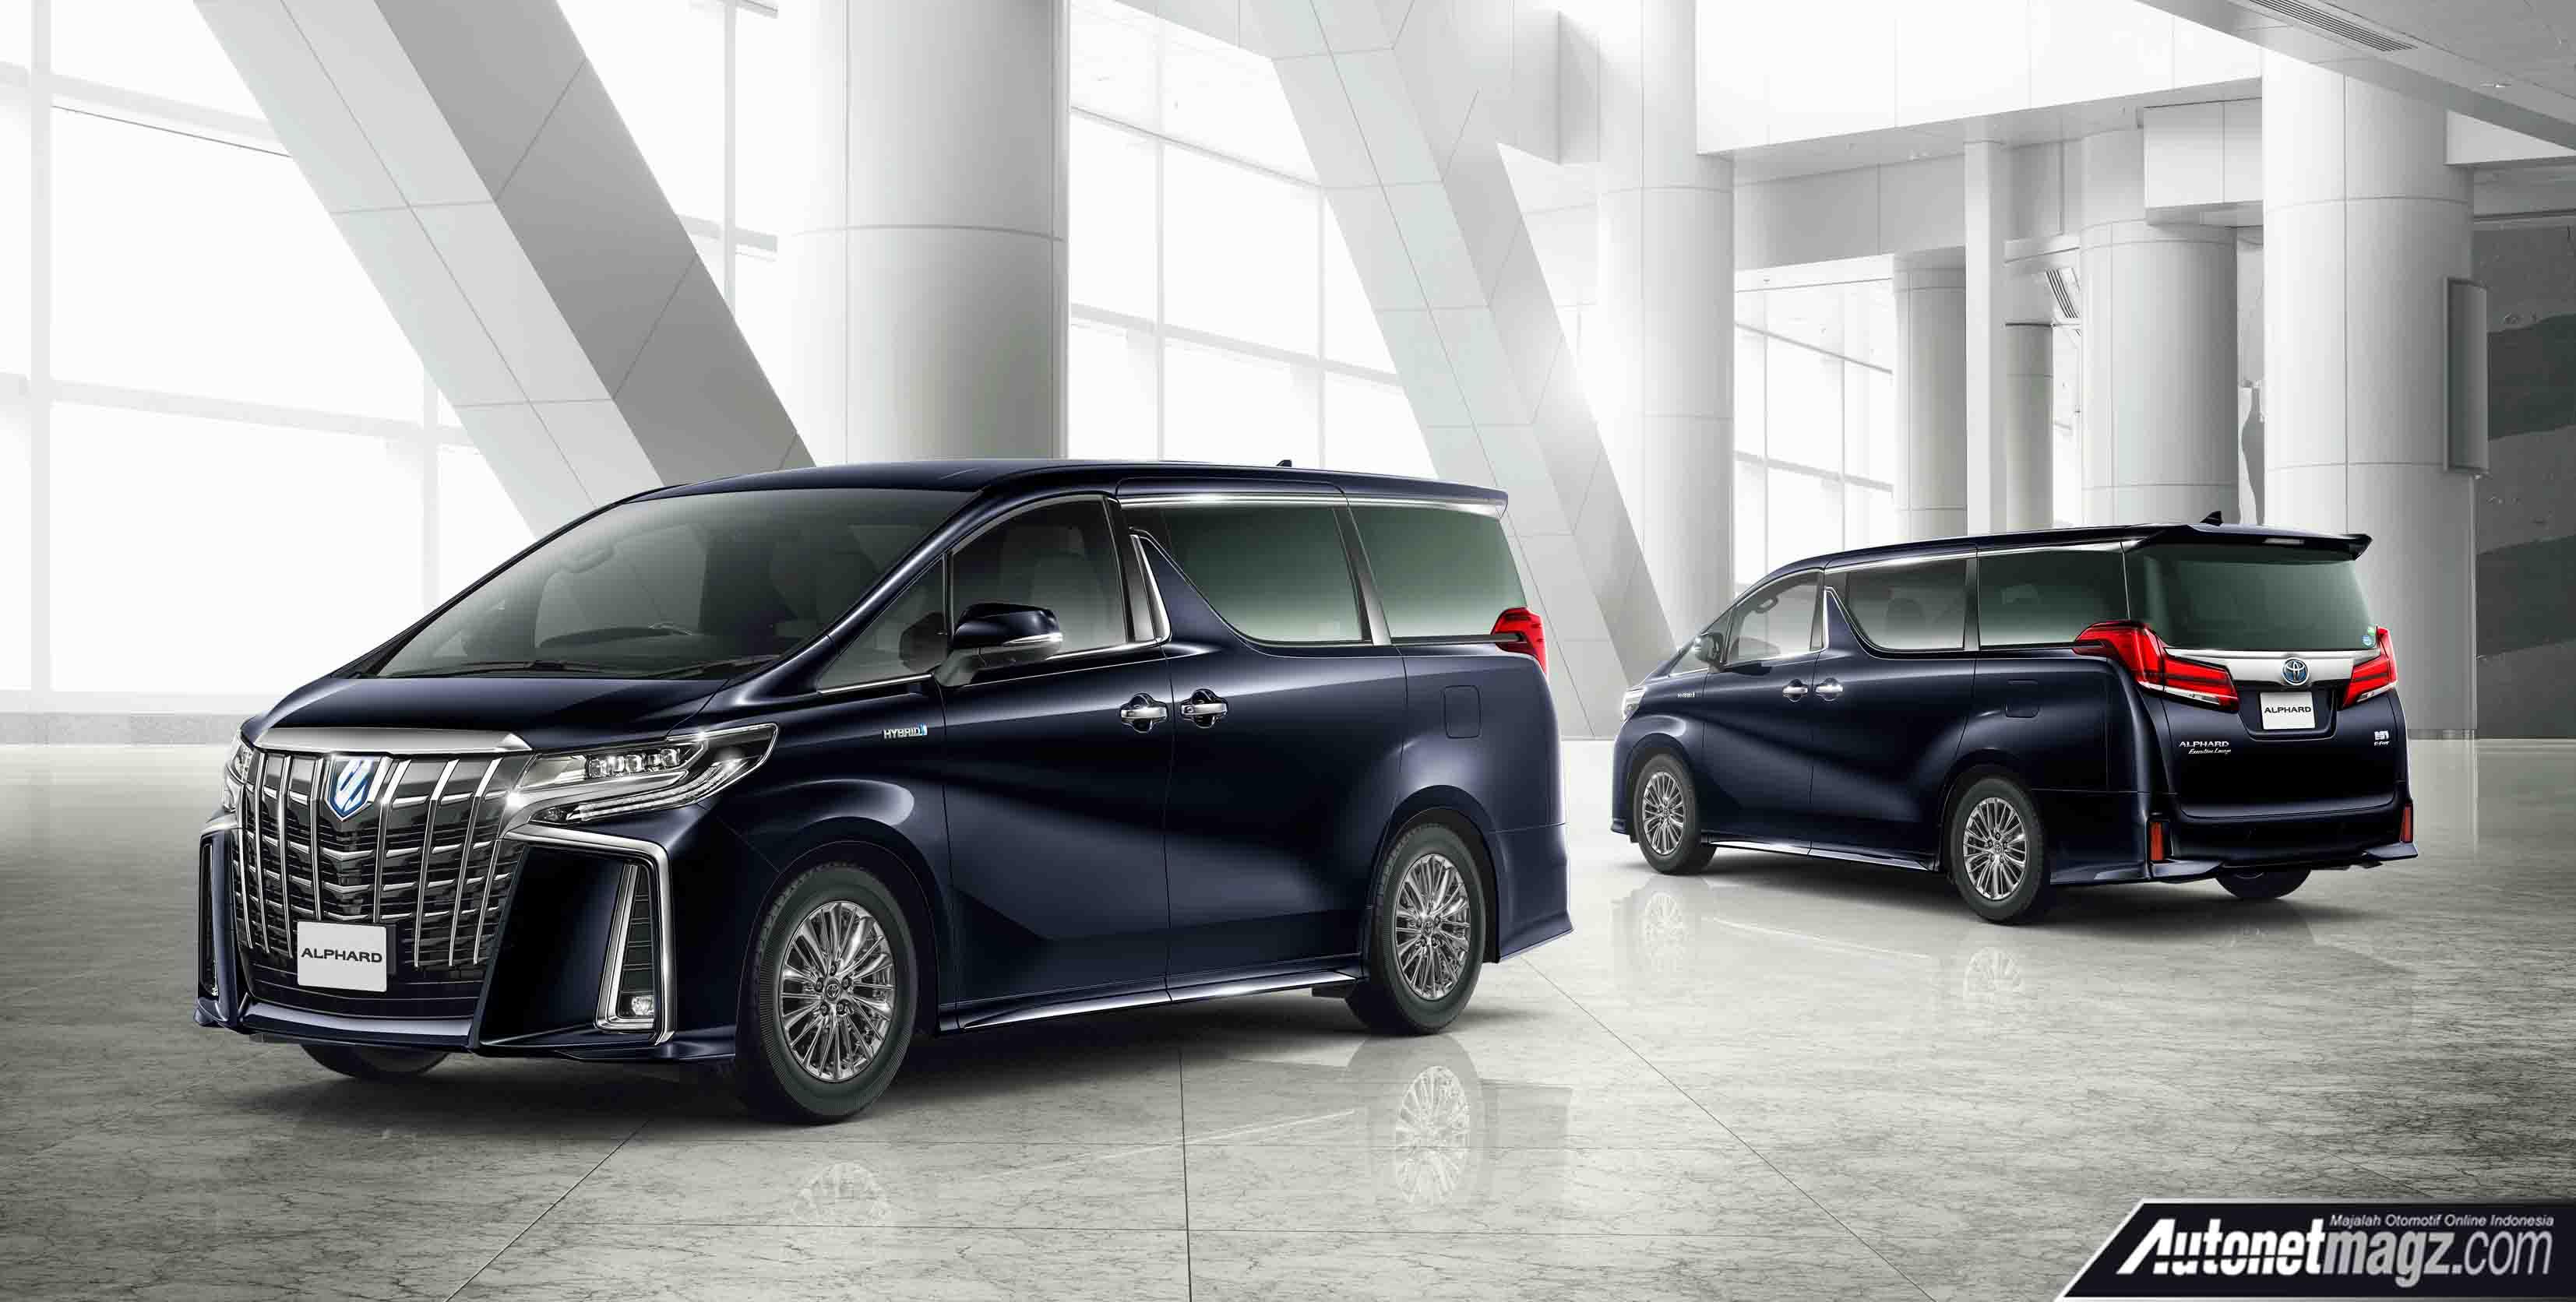 all new toyota vellfire 2018 grand avanza alphard facelift  autonetmagz review mobil